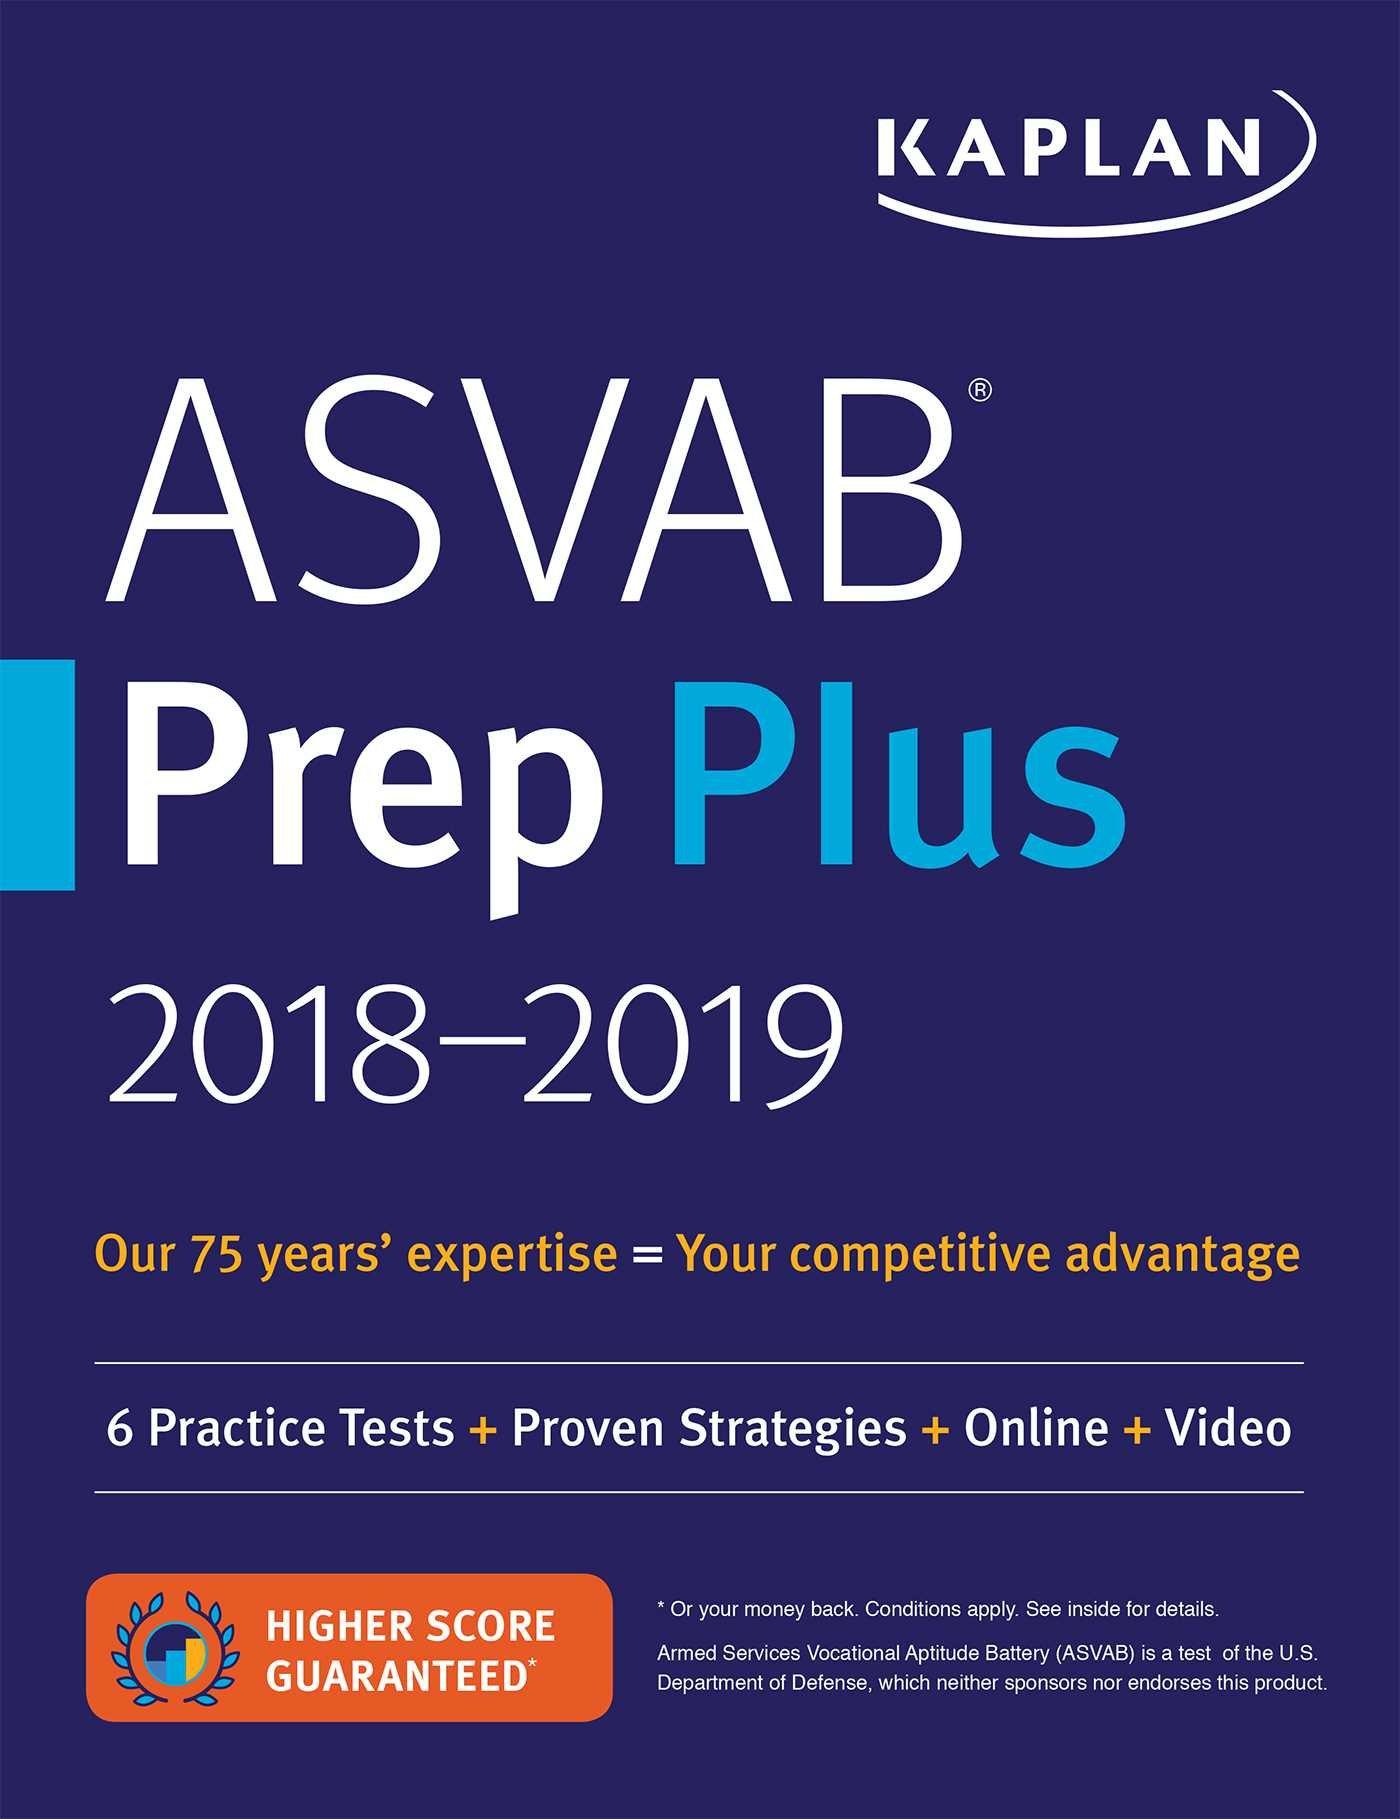 ASVAB Prep Plus 2018-2019: 6 Practice Tests + Proven Strategies + Online + Video (Kaplan Test Prep) by Kaplan Publishing